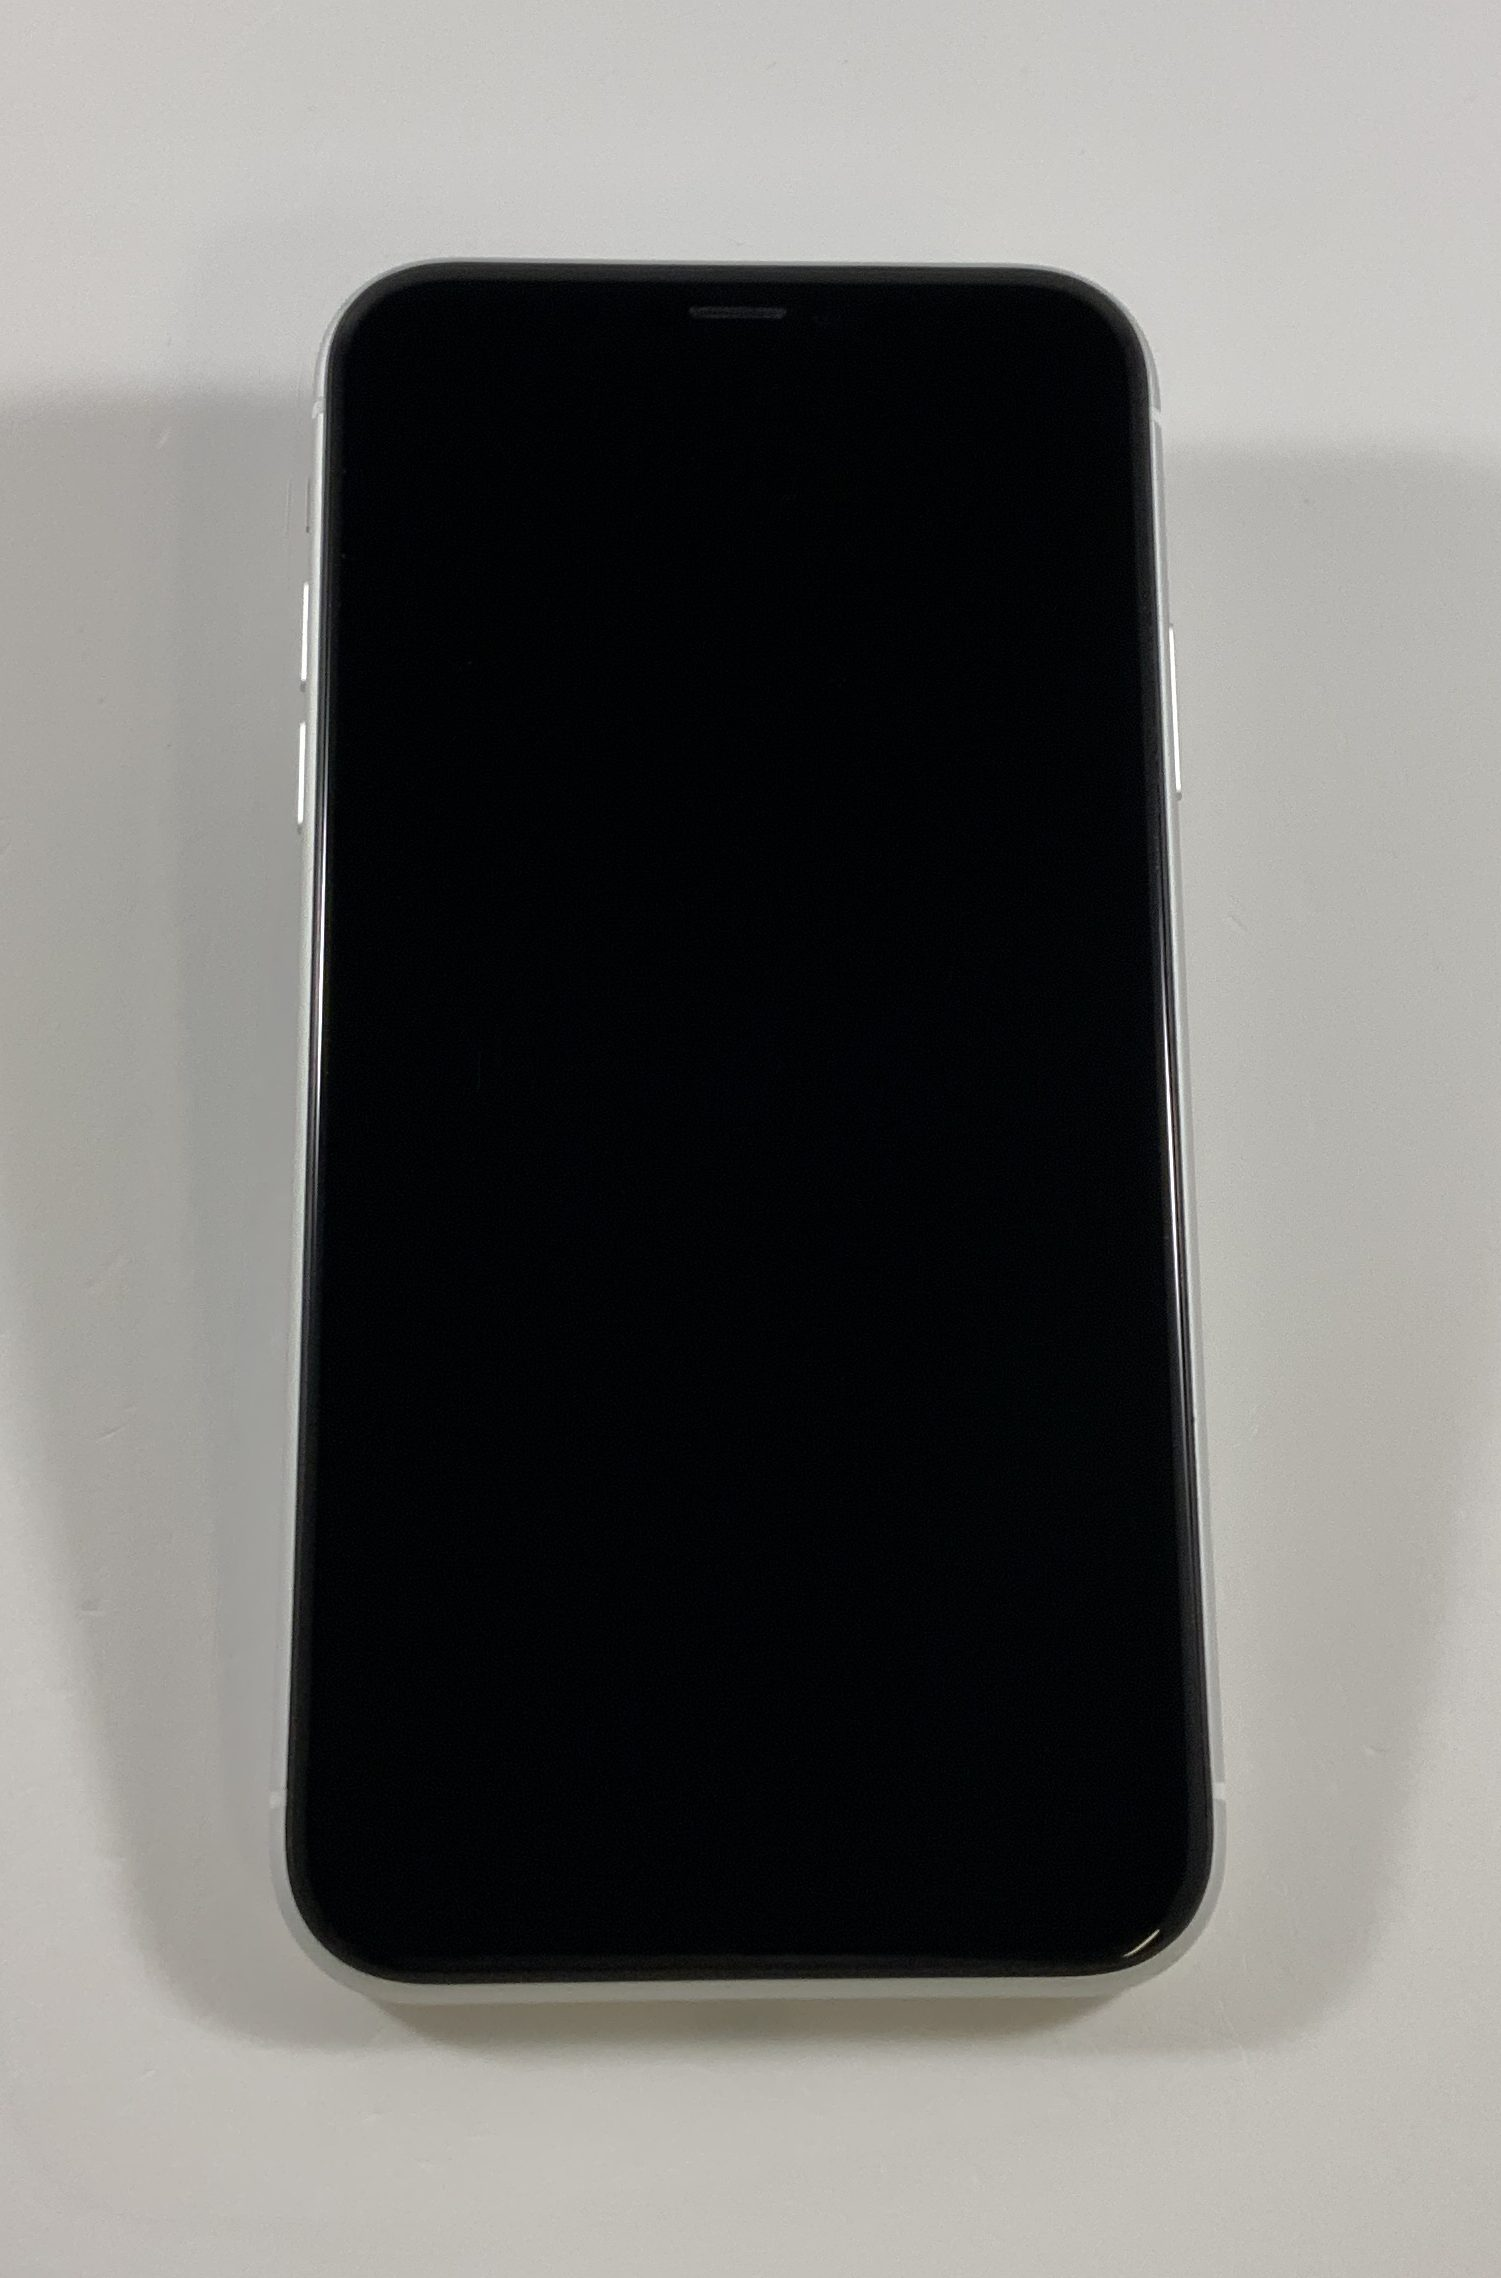 iPhone XR 128GB, 128GB, White, image 1